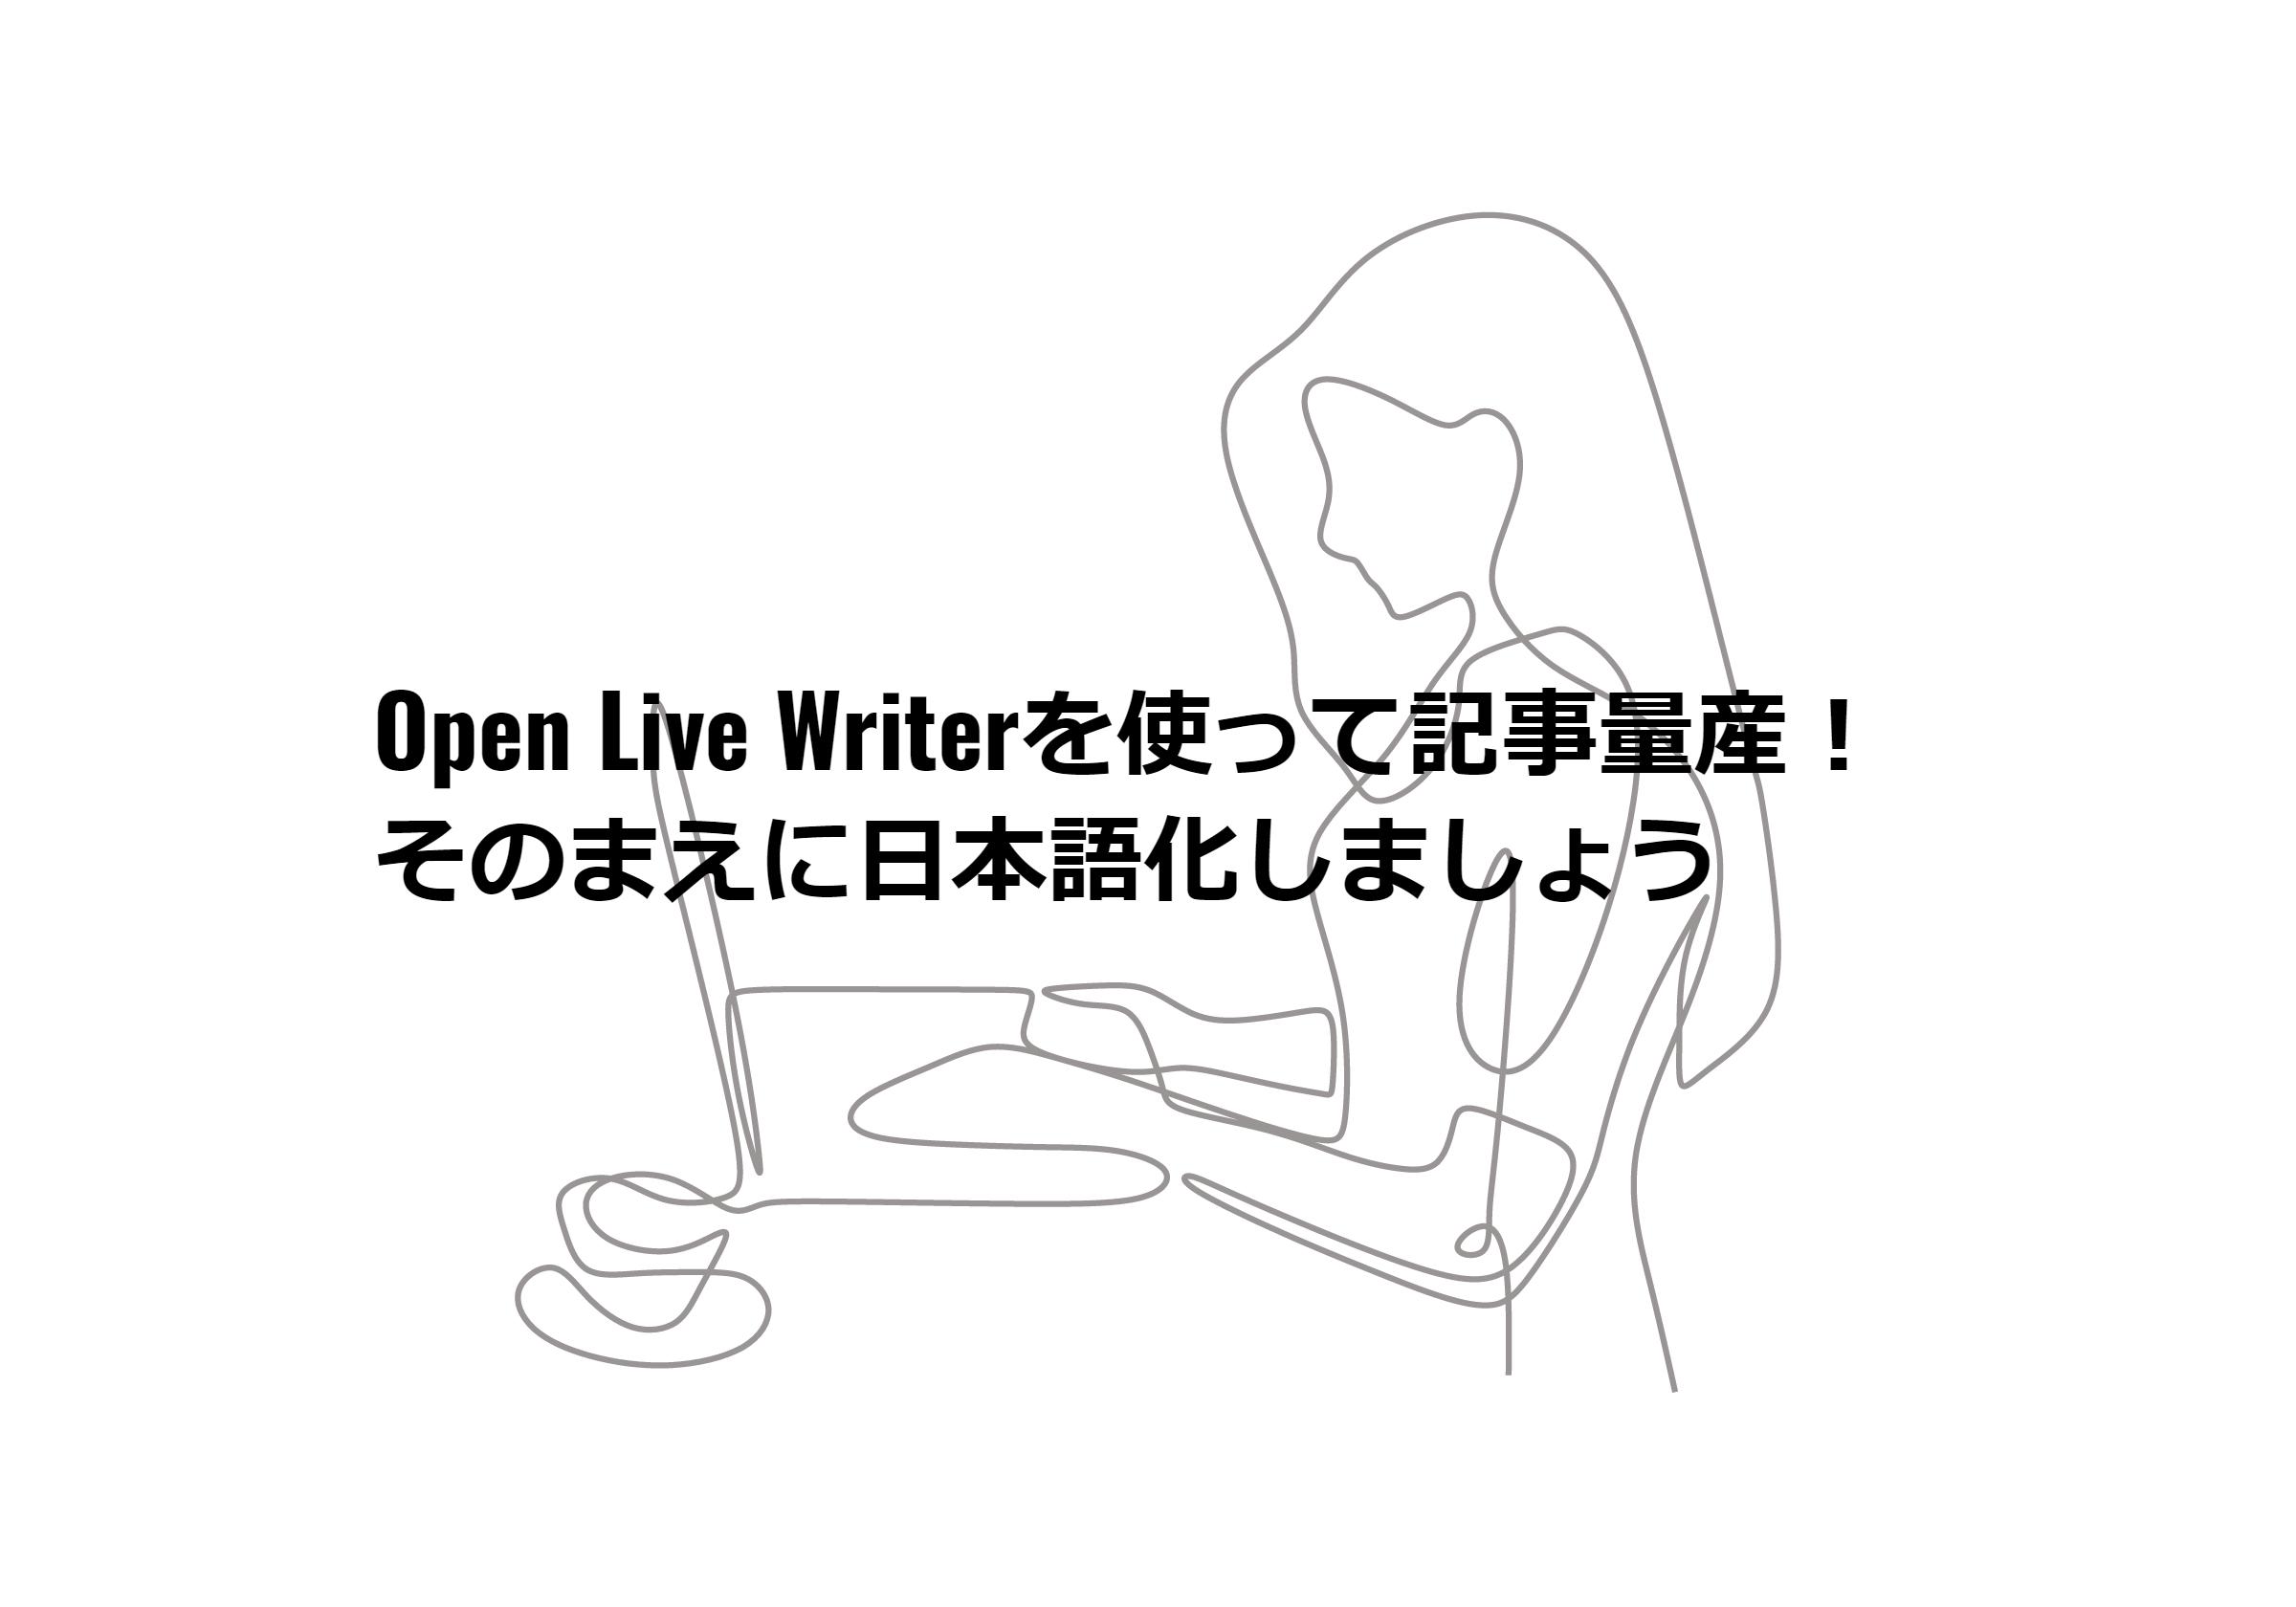 Open Live Writerー記事ー日本語化